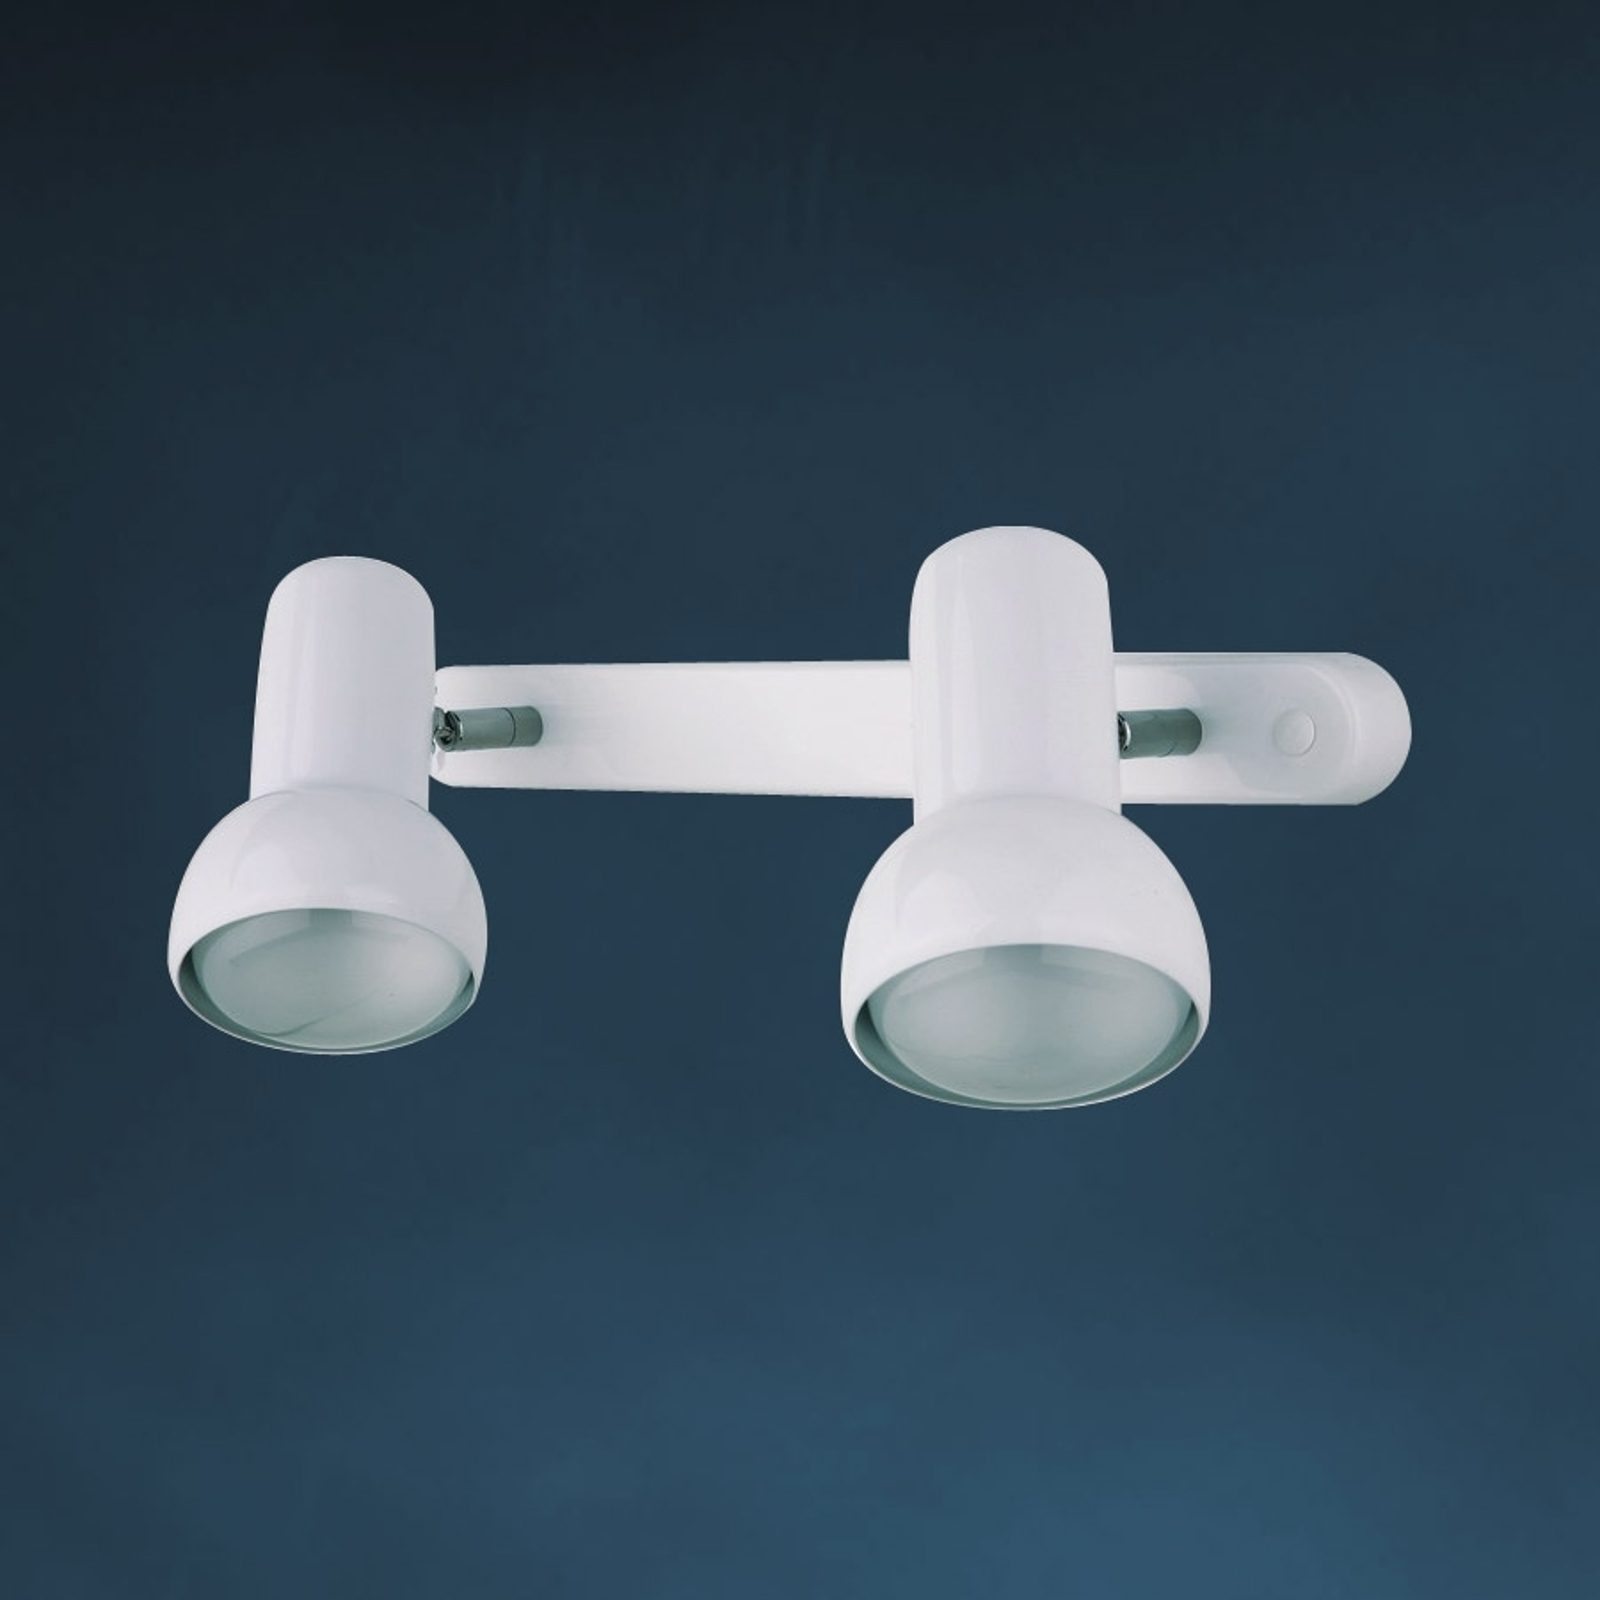 EIFEL væglampe i retro-design, 2 lyskilder